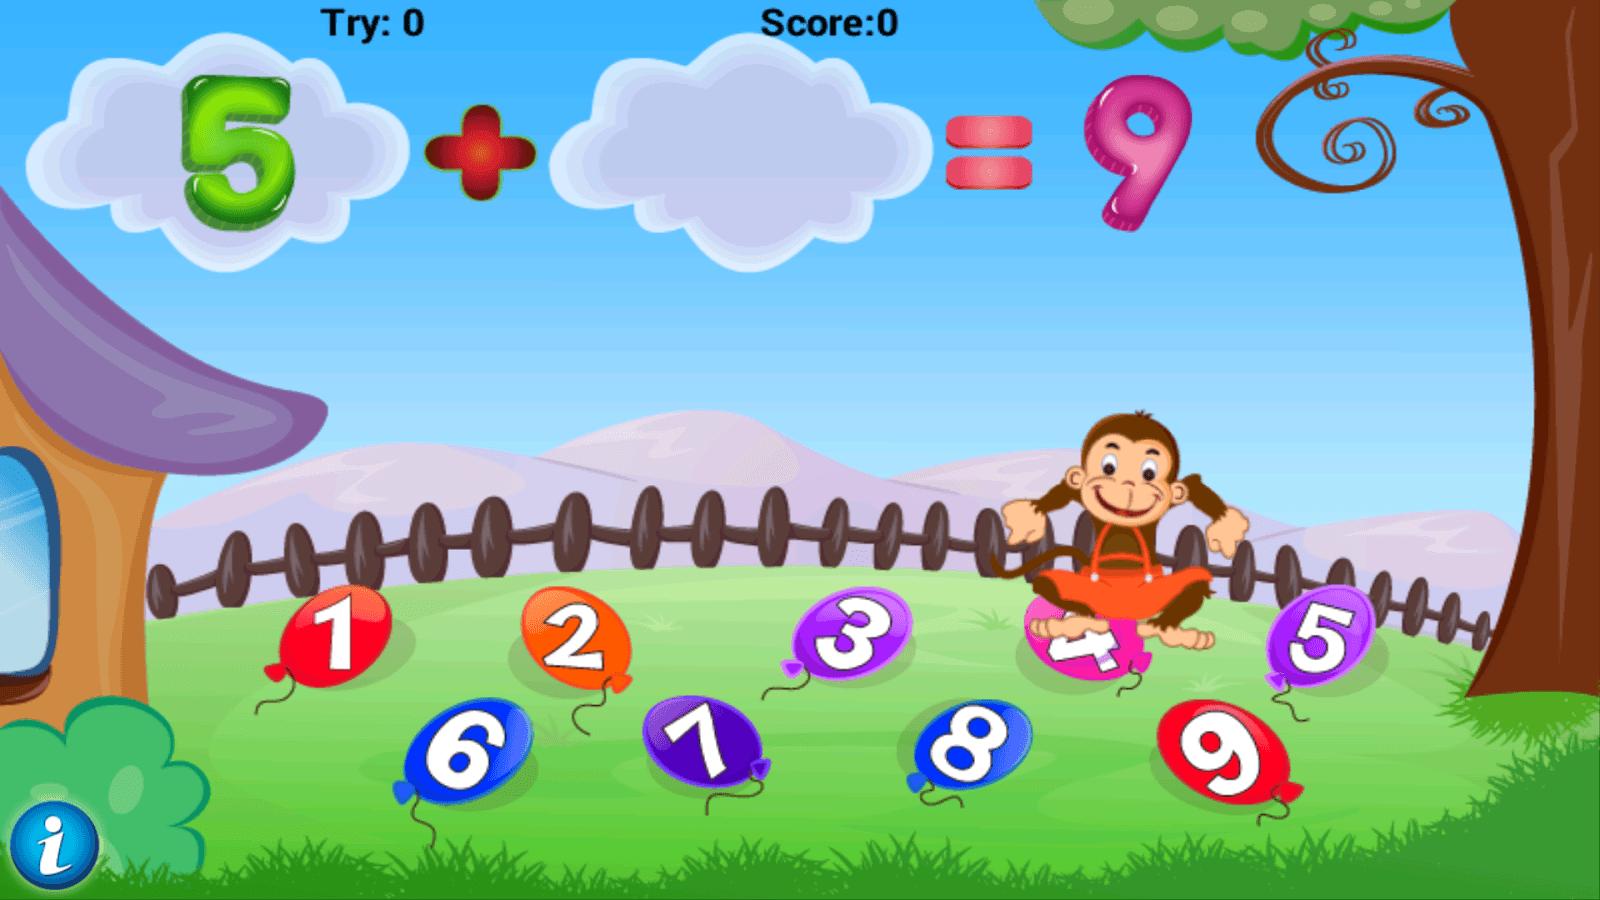 Math And Language Games Make Children Better Students - Health Units